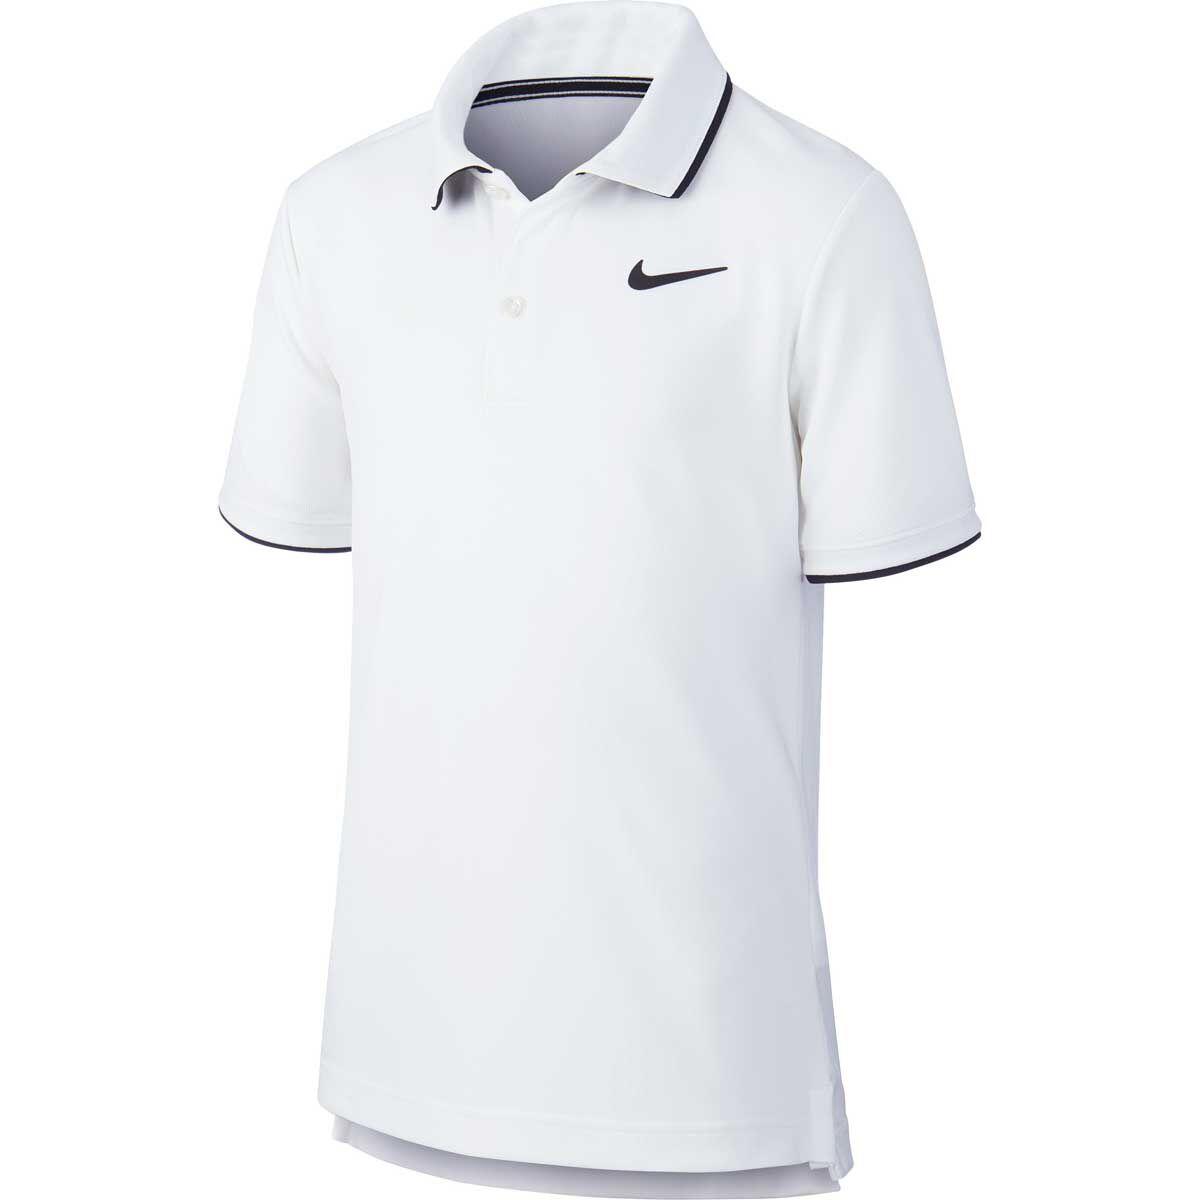 Nike Dri Fit Polo Shirt Blue and White 12 NWT Boy M 10